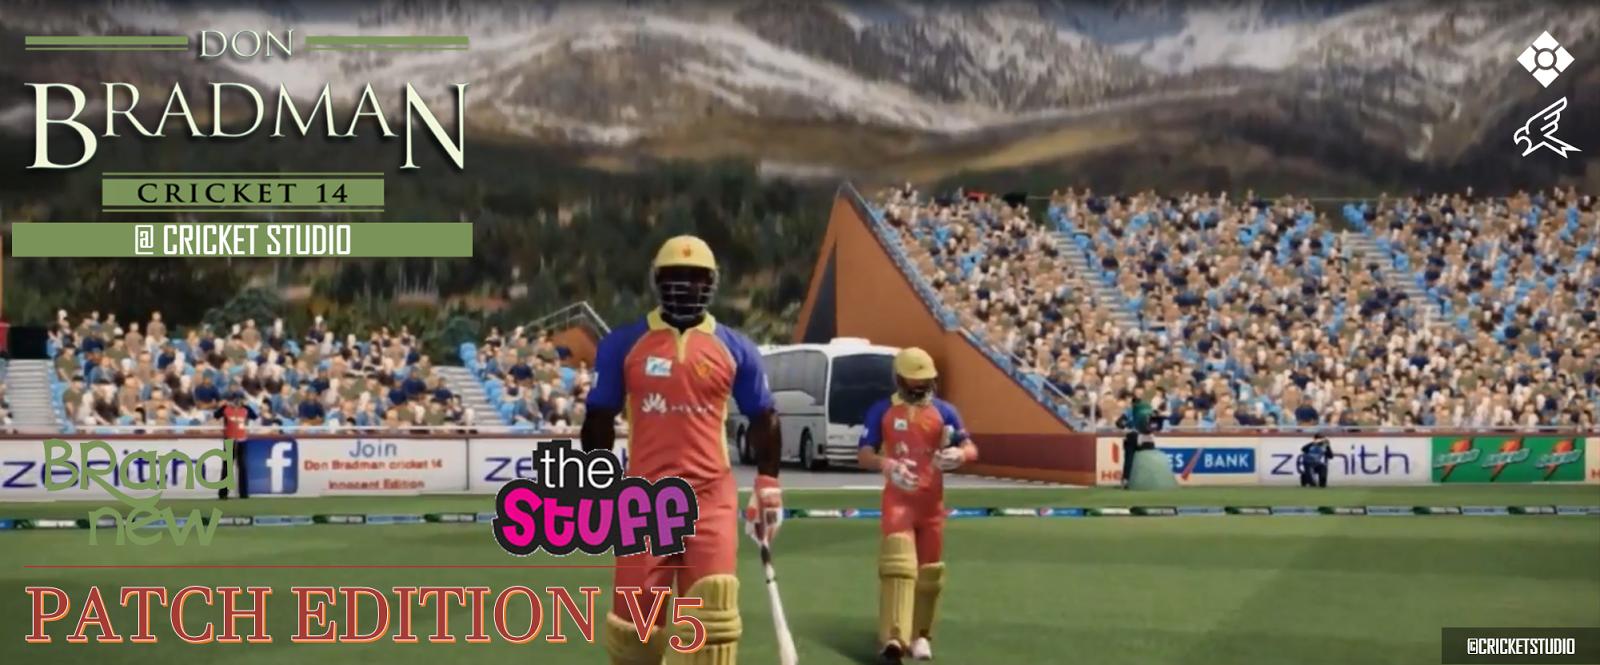 free download don bradman cricket 14 for pc